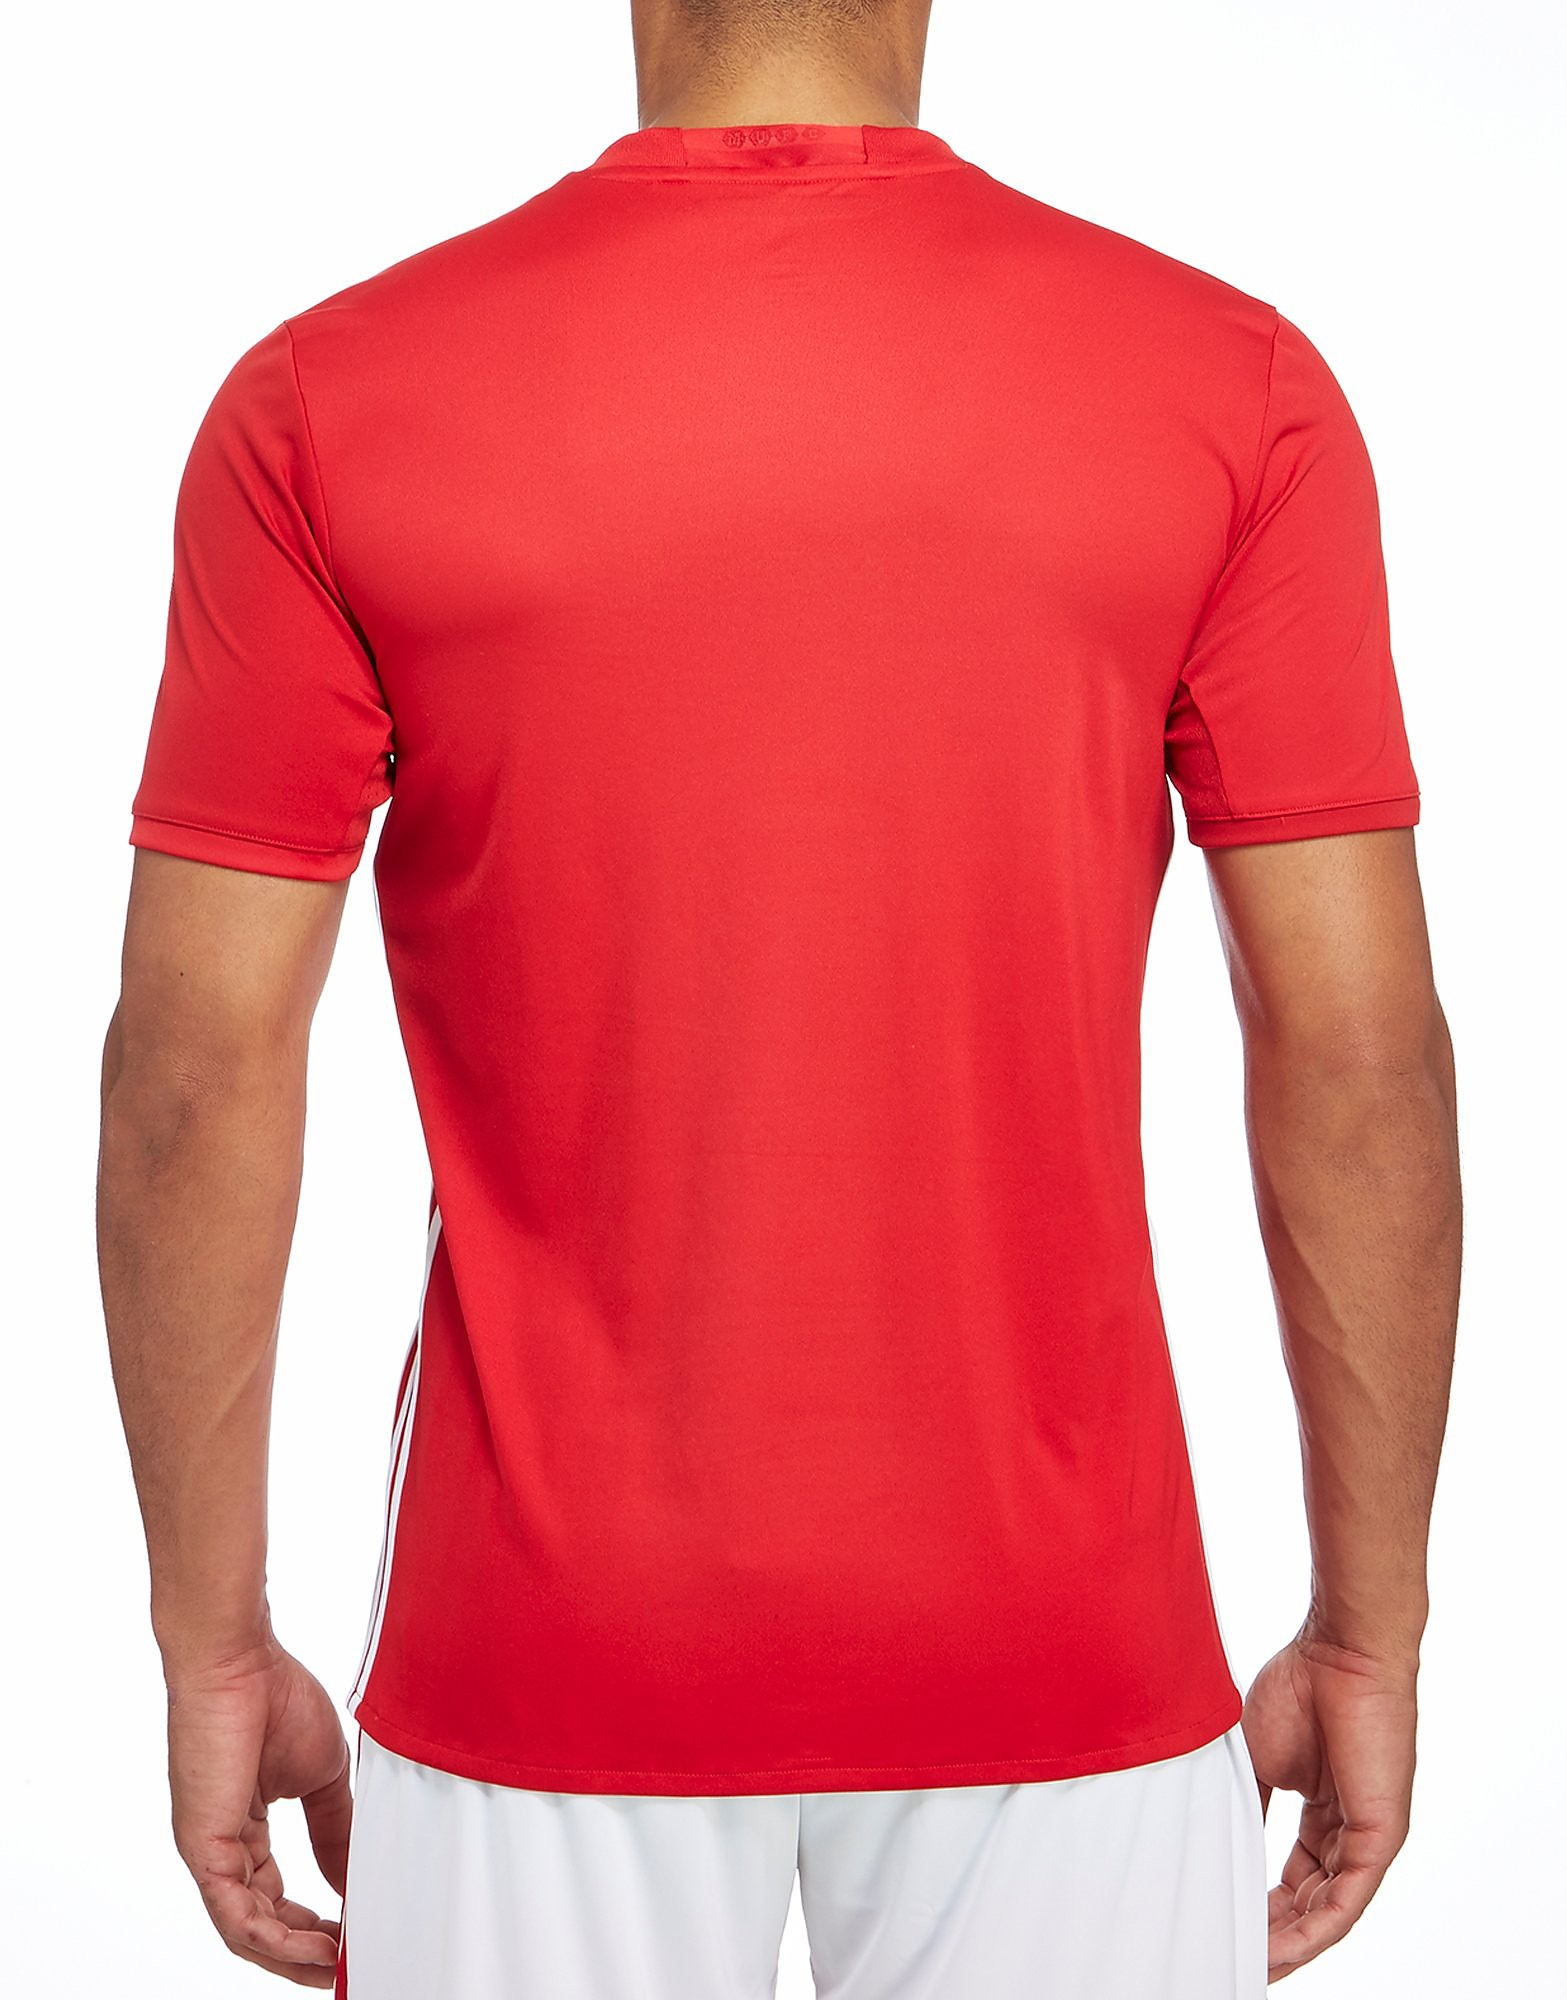 adidas Manchester United FC 2016/17 Home Shirt